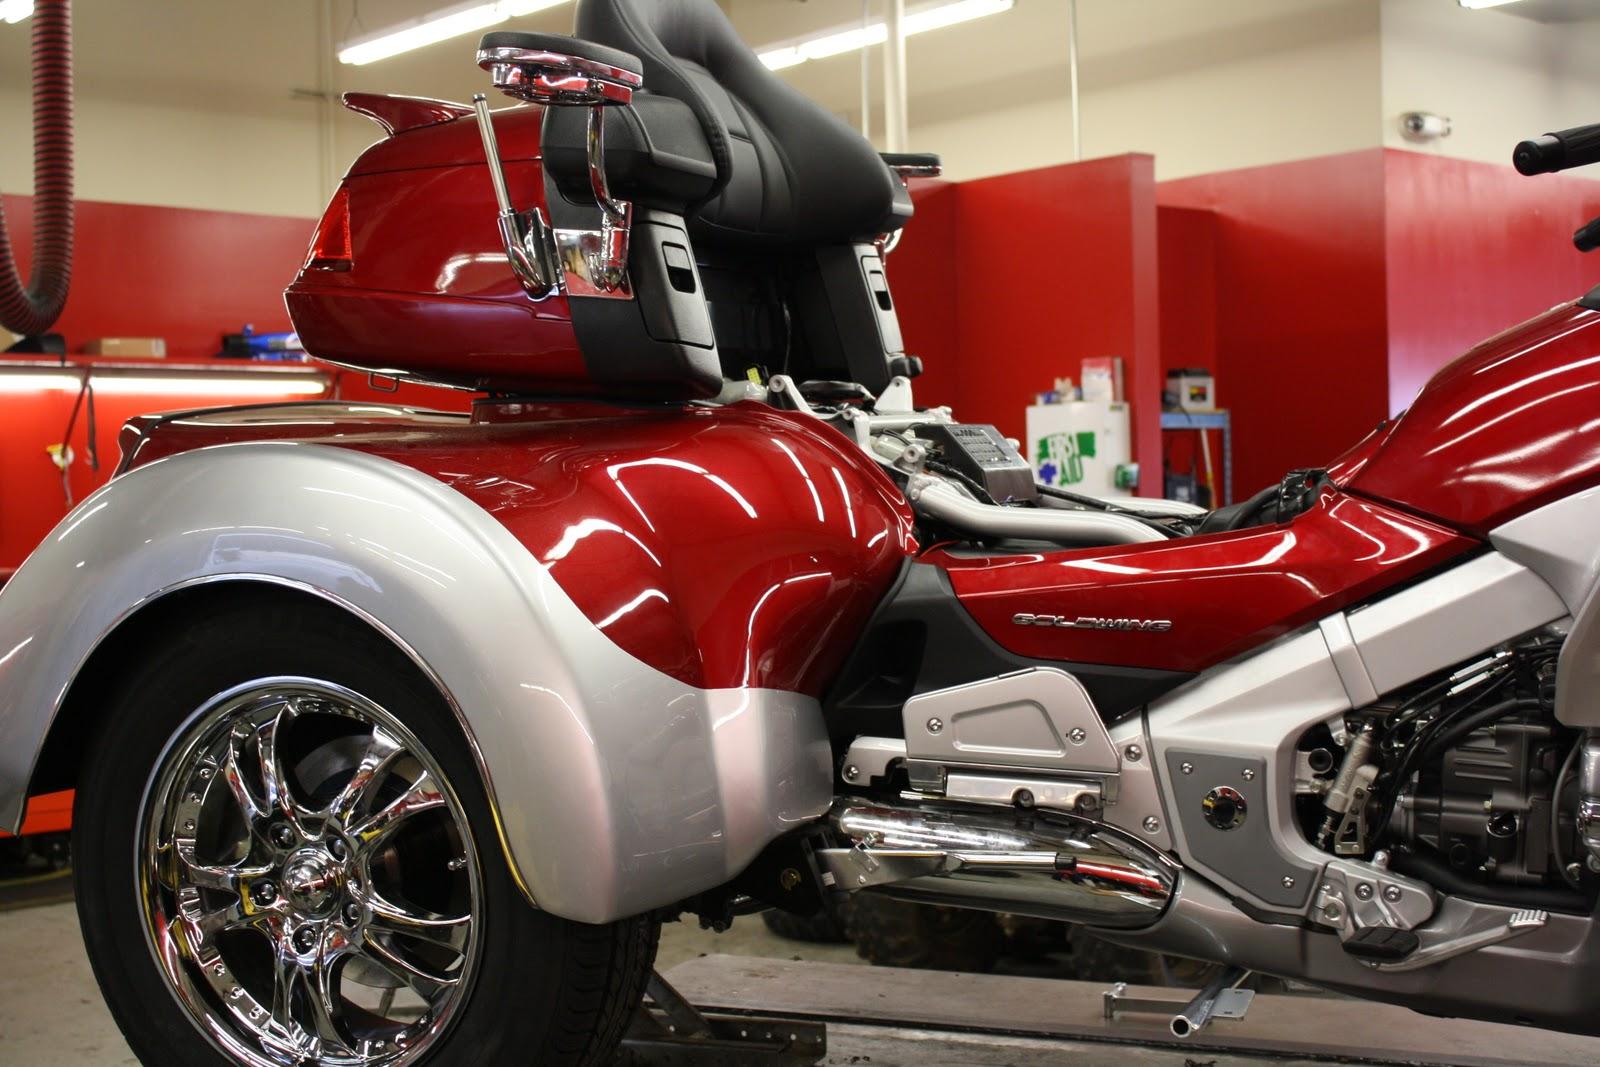 Heartland Honda: September 2011